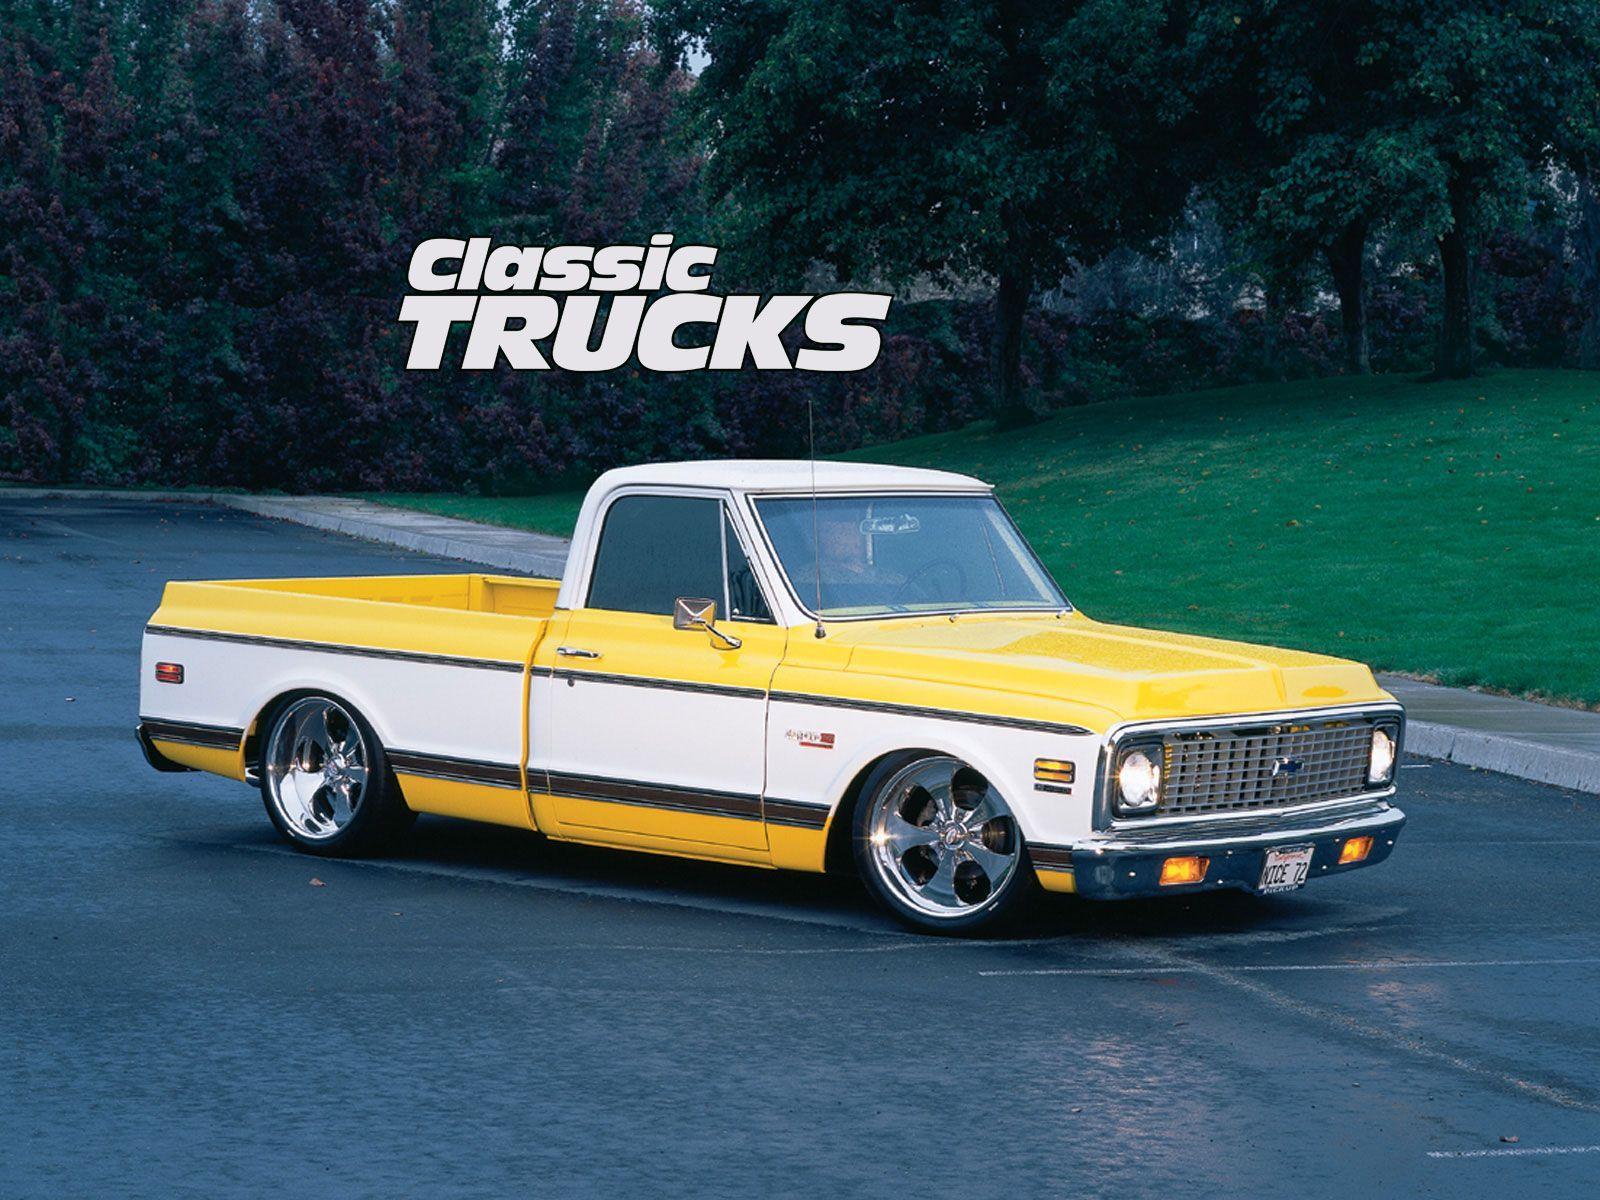 Classic Truck Desktop Wallpapers 1600x1200 Photo 17 Classic Trucks Classic Truck Chevy C10